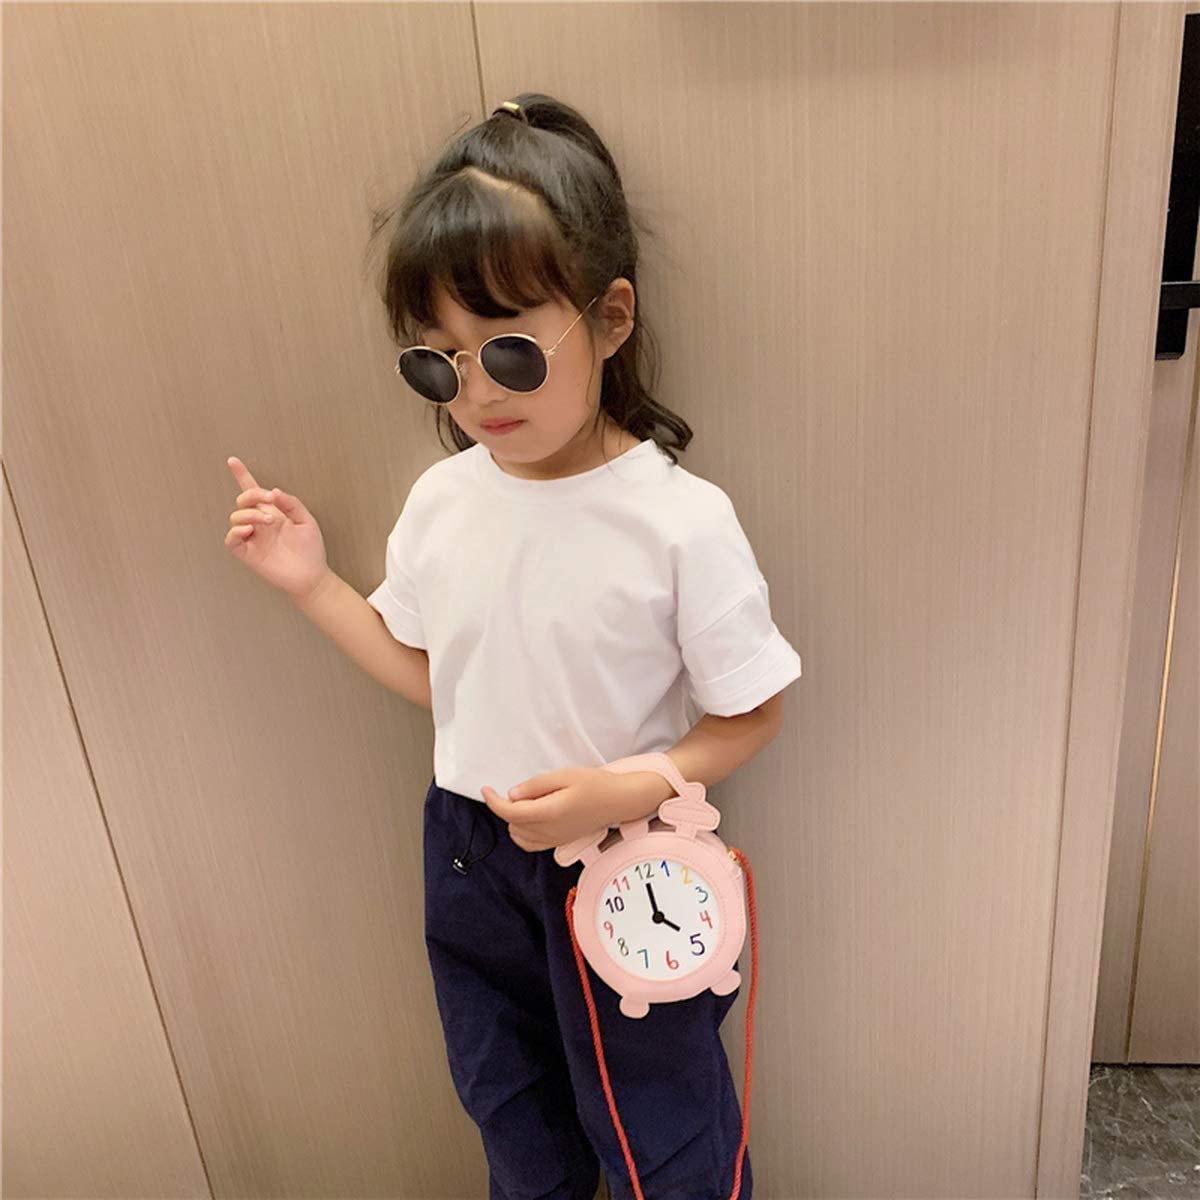 Girls Crossbody Purse Mini Single Shoulder Bags Coin Handbags for Kids